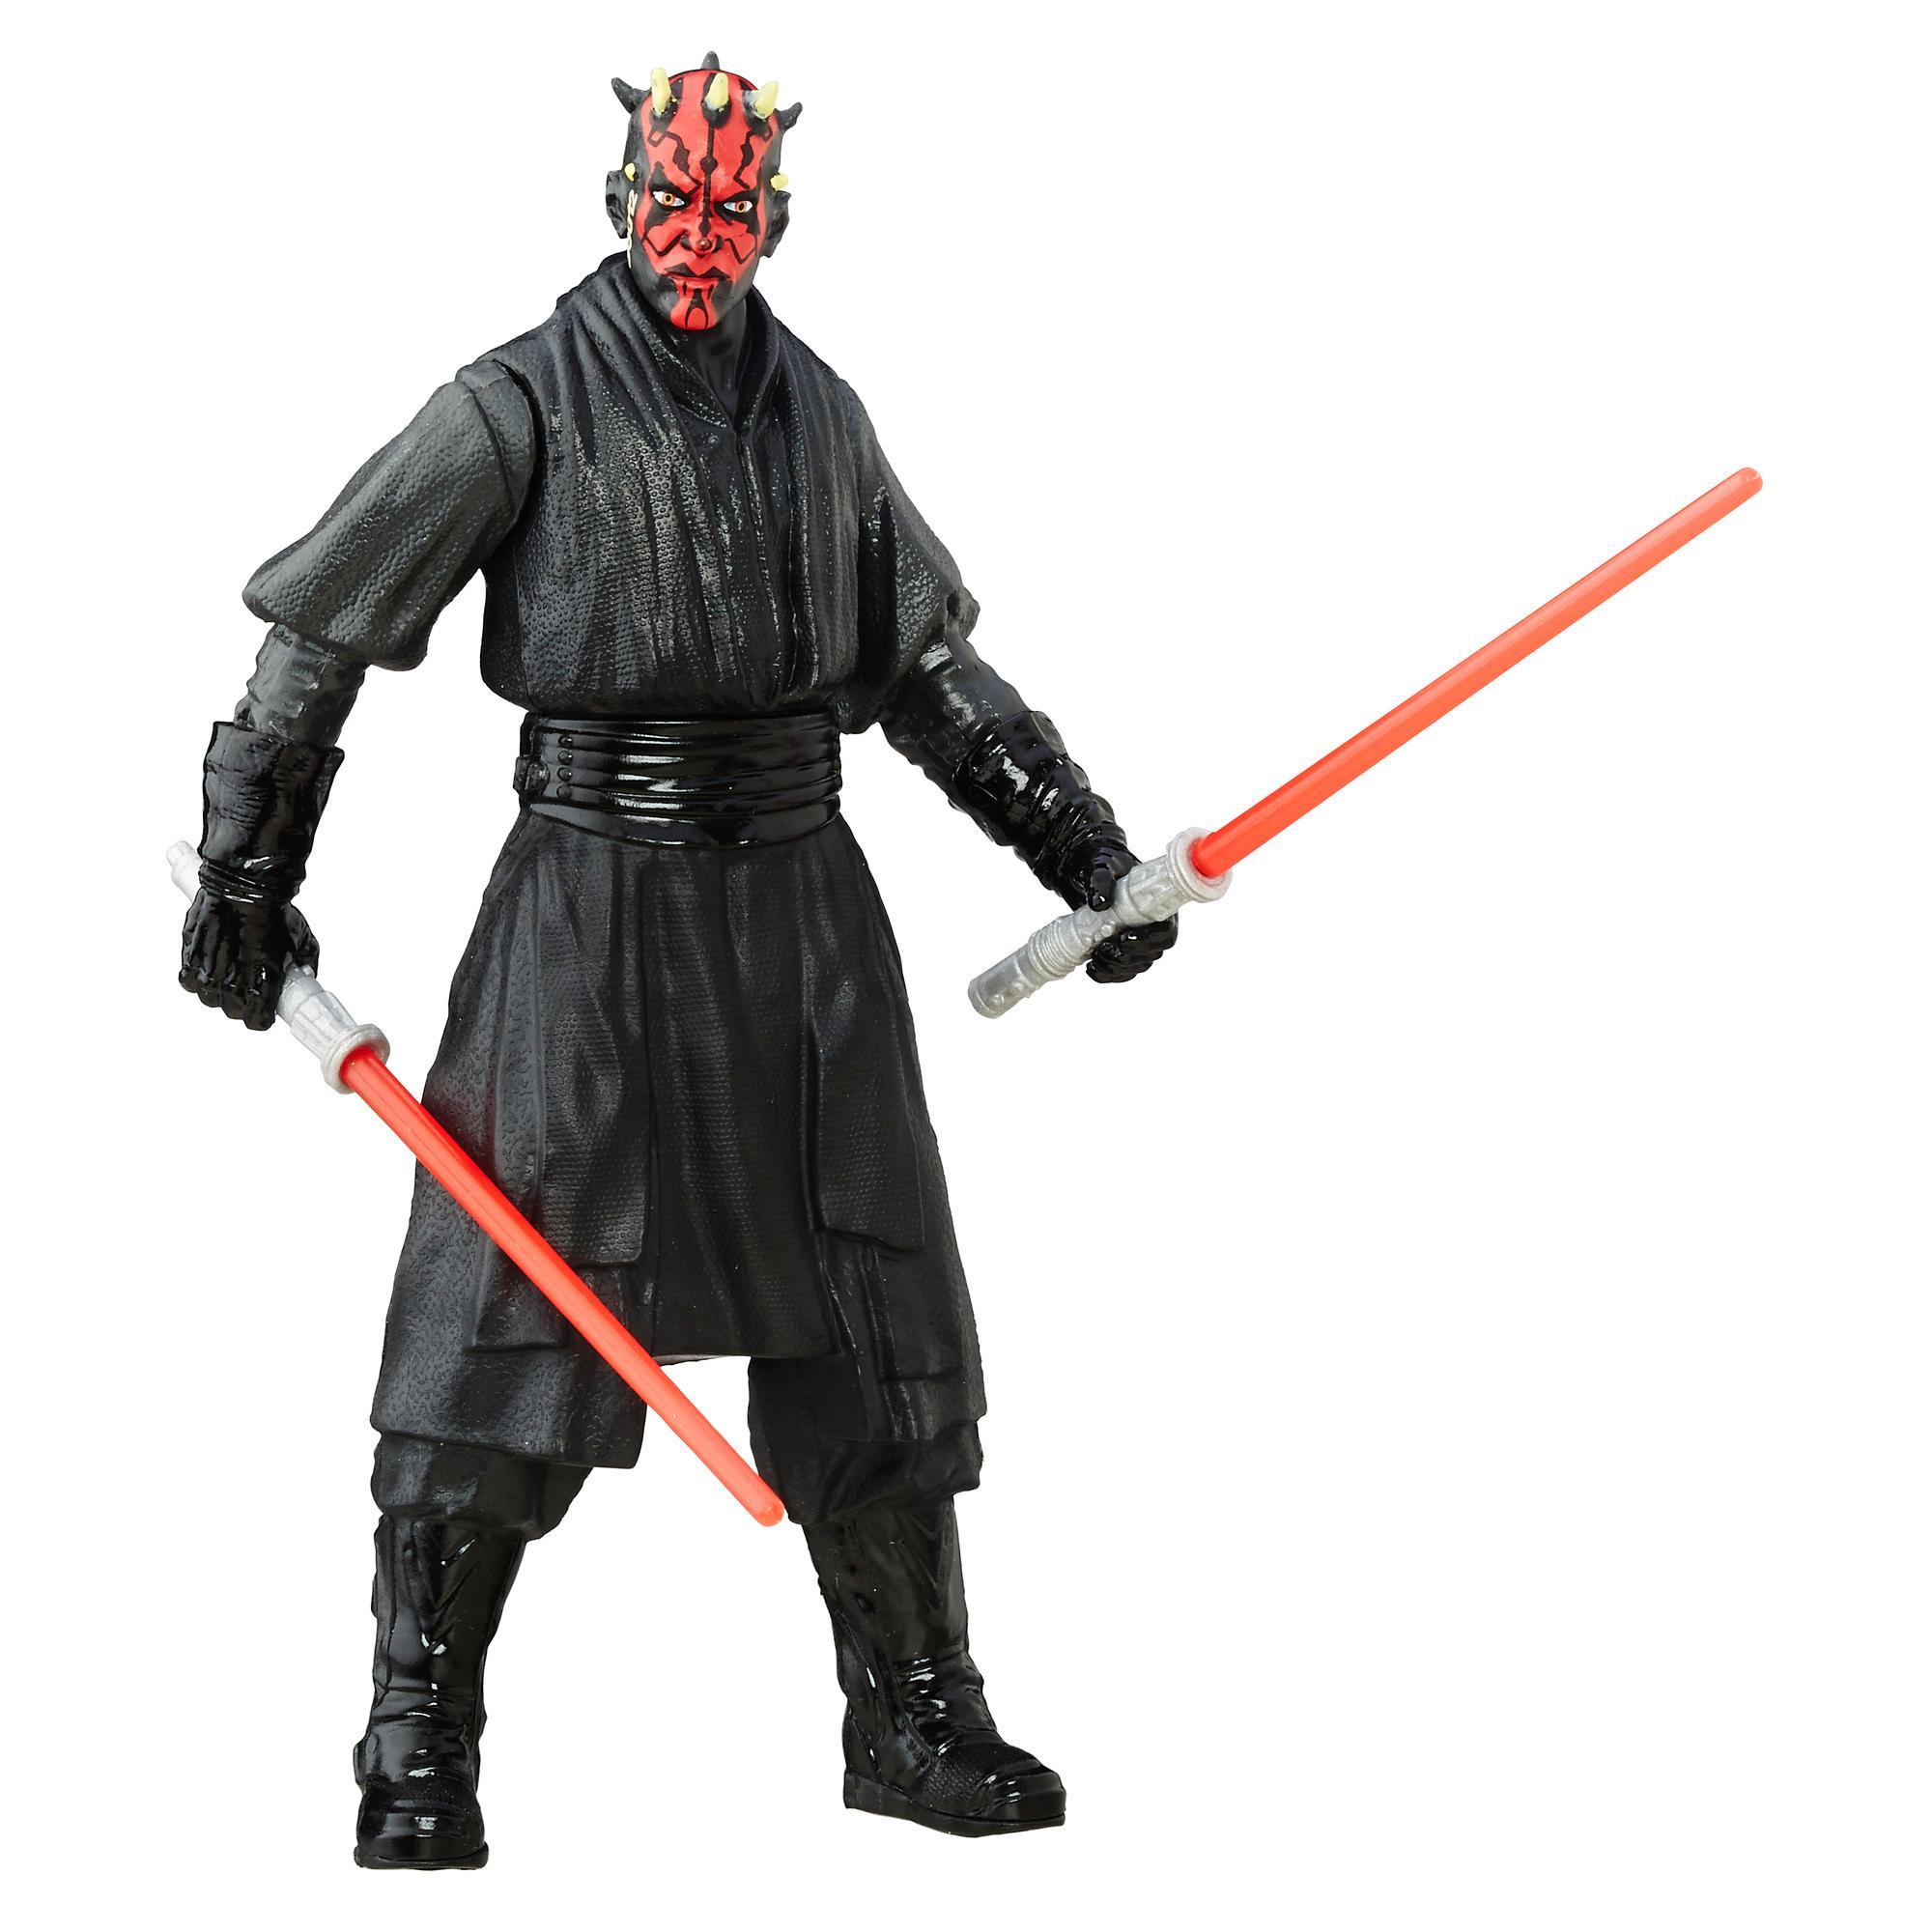 Star Wars Épisode I - Figurine de 15 cm de Darth Maul